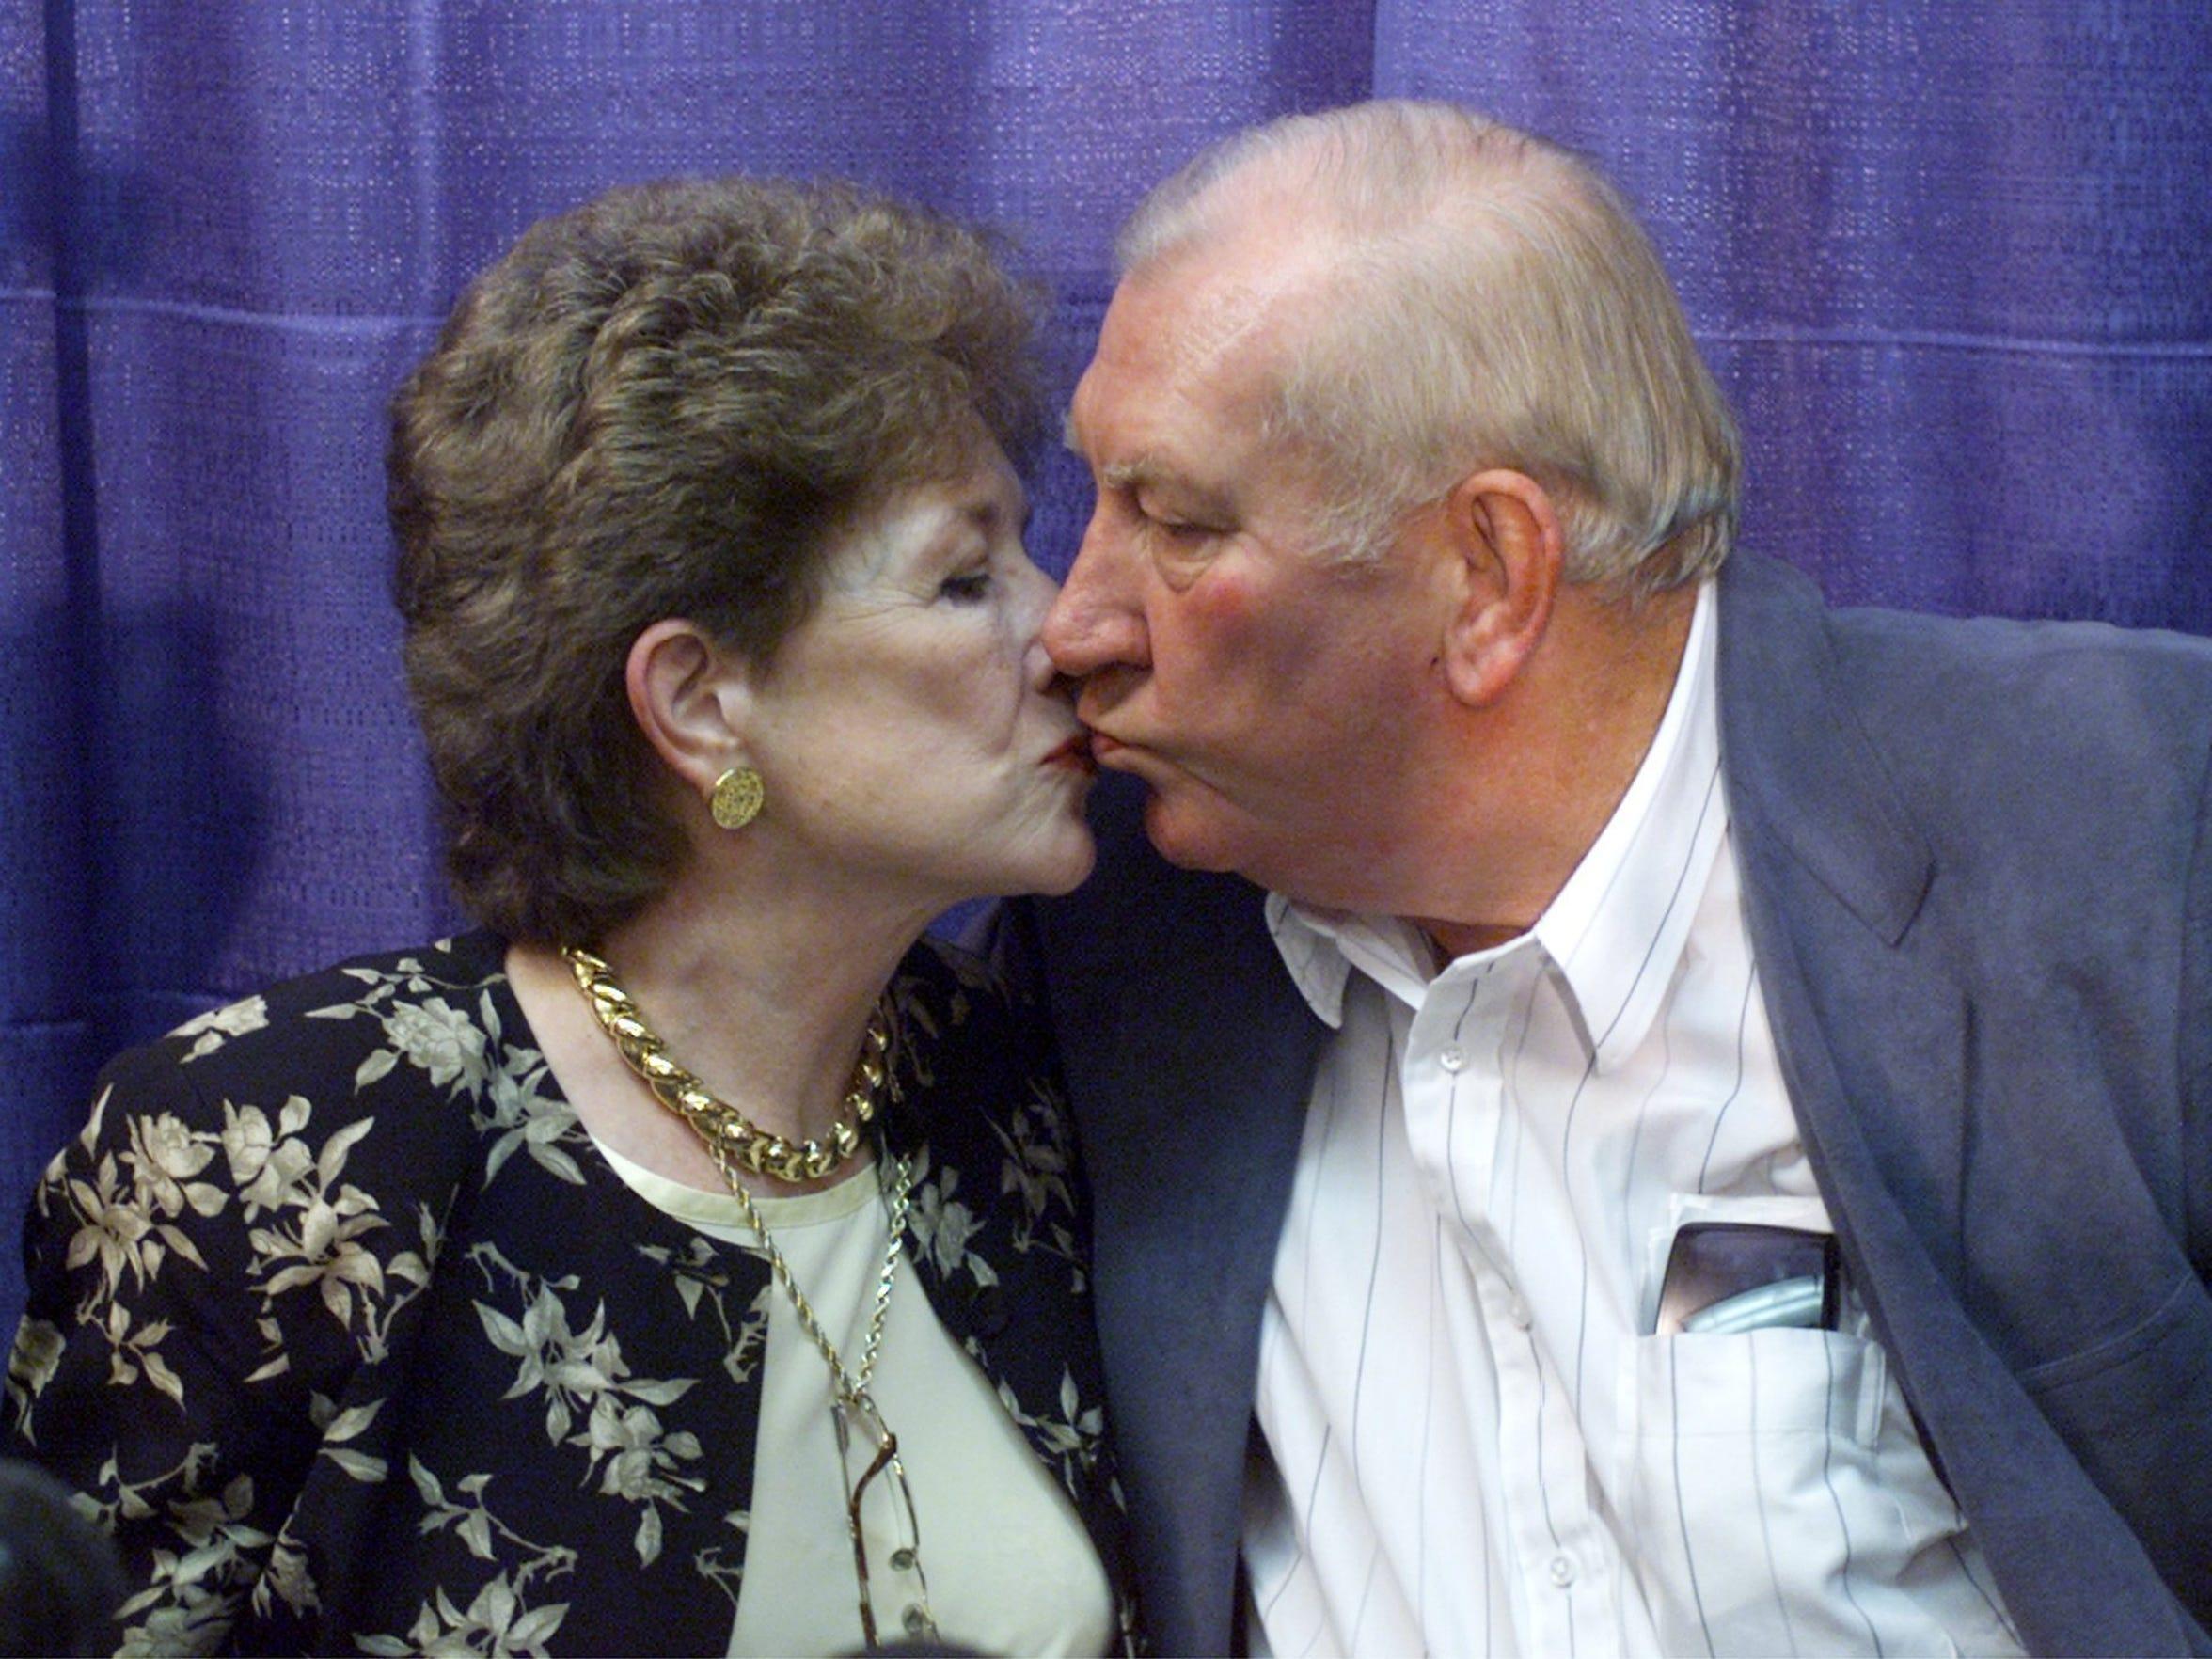 Mary Haskins, Coach Don Haskins